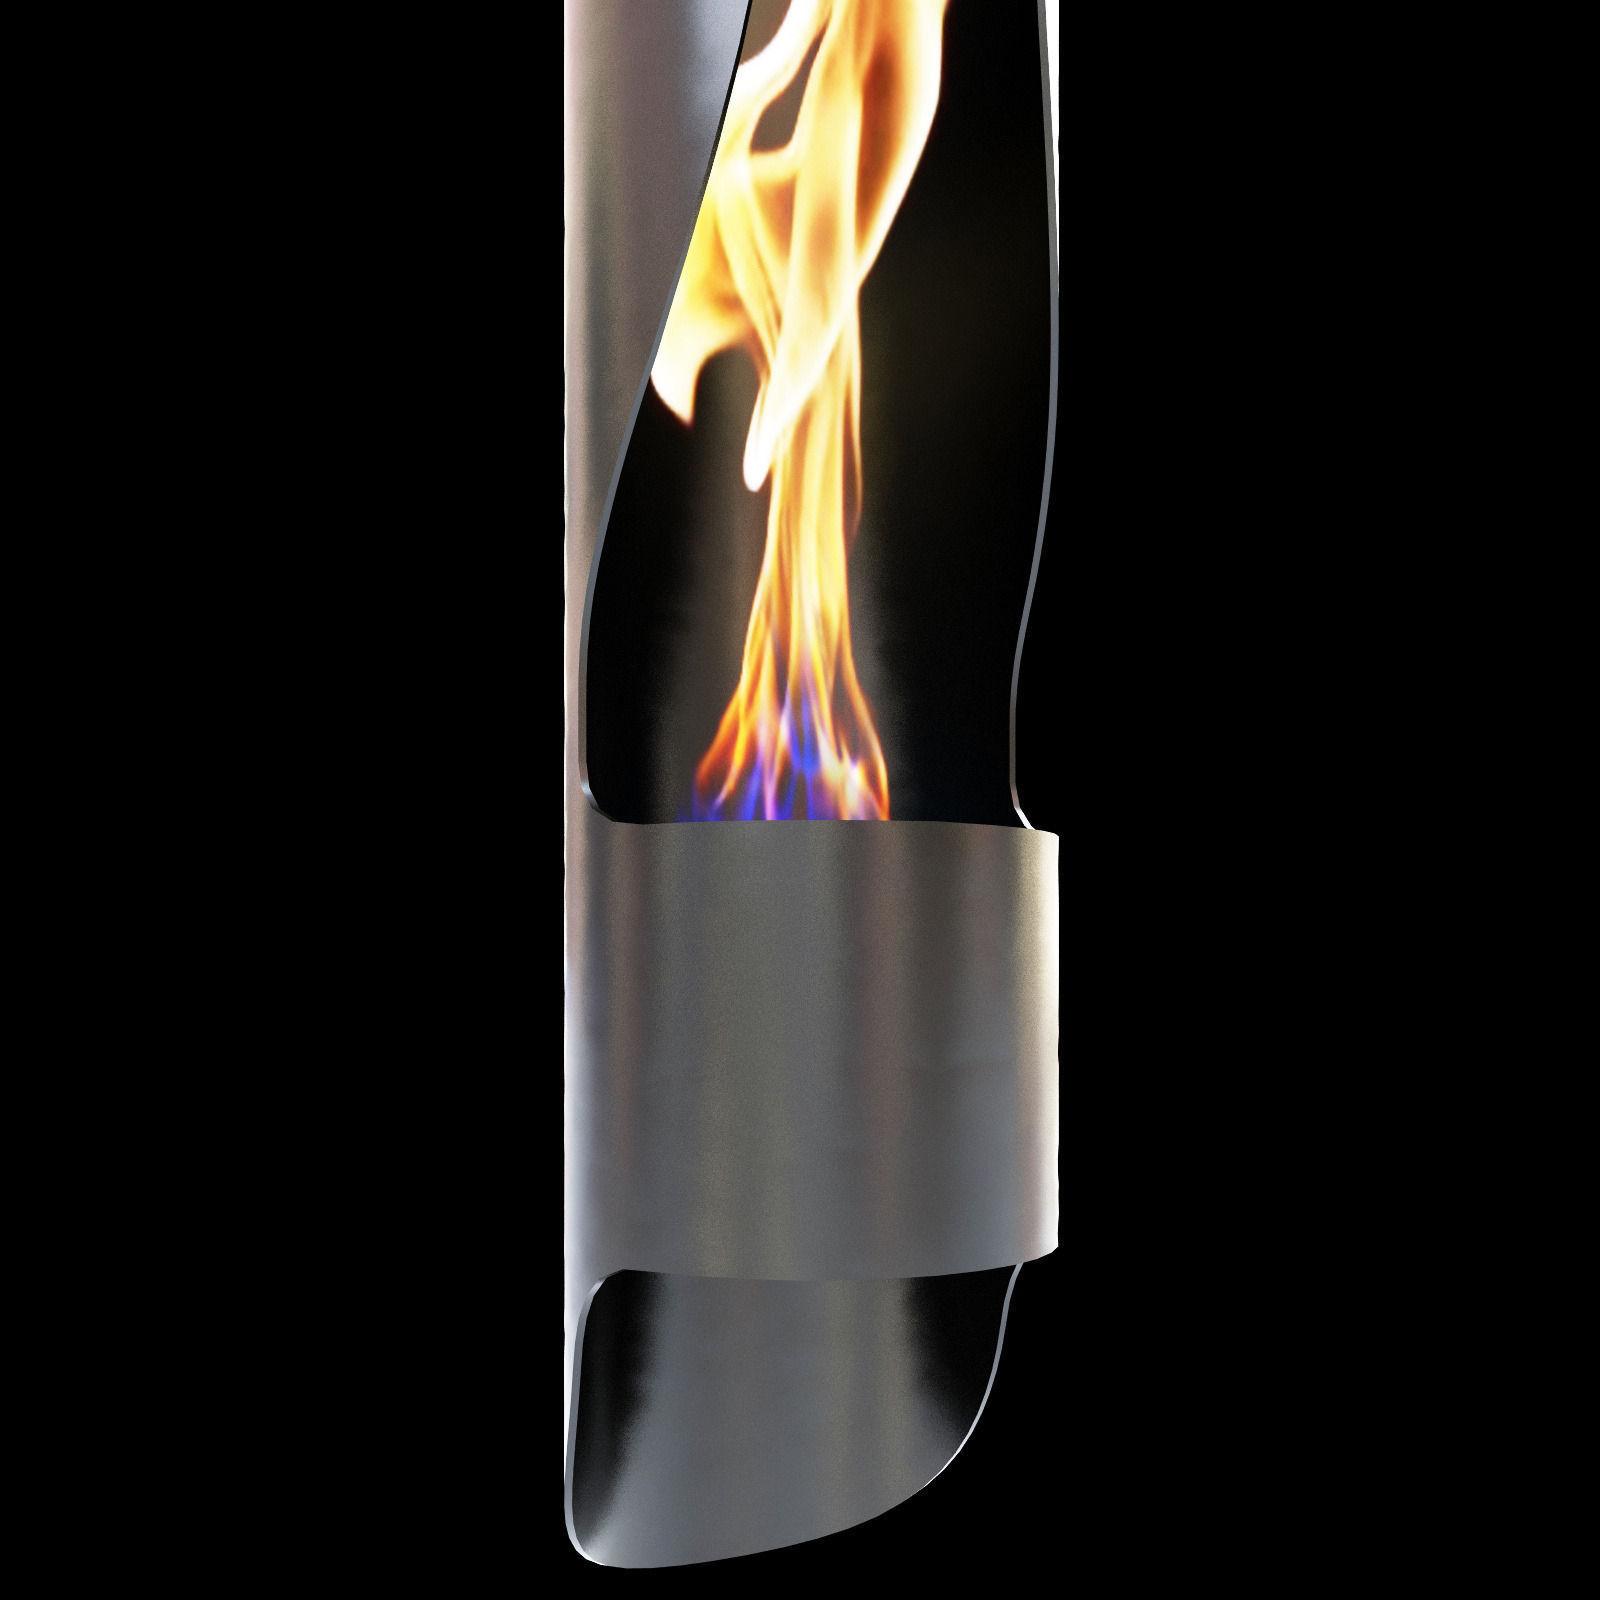 acquaefuoco wellness mood tube fireplace 3d model max obj 3ds fbx mtl